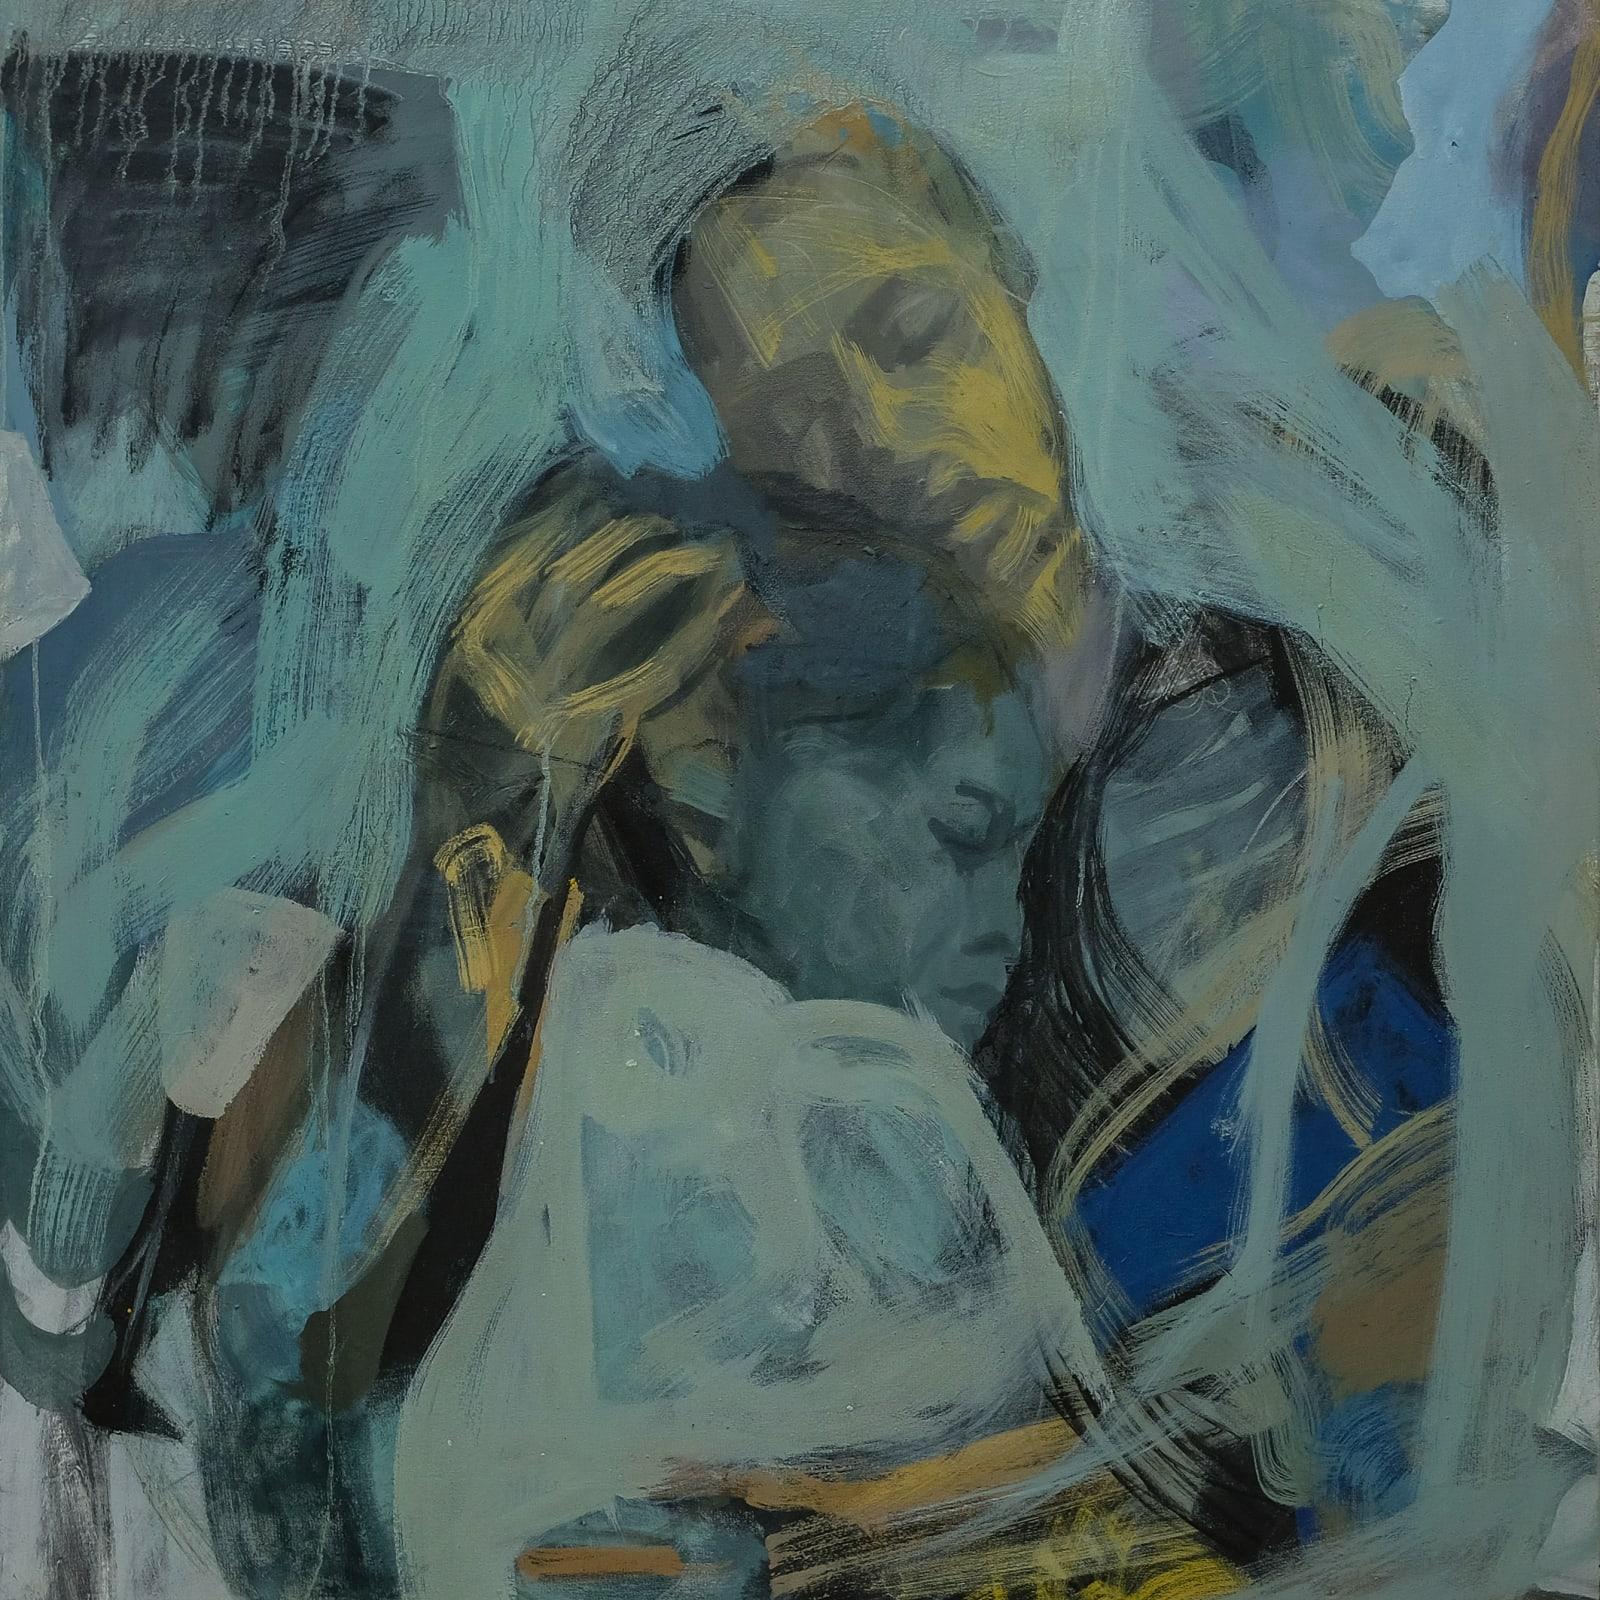 Tizta Berhanu, Consolation, 2018